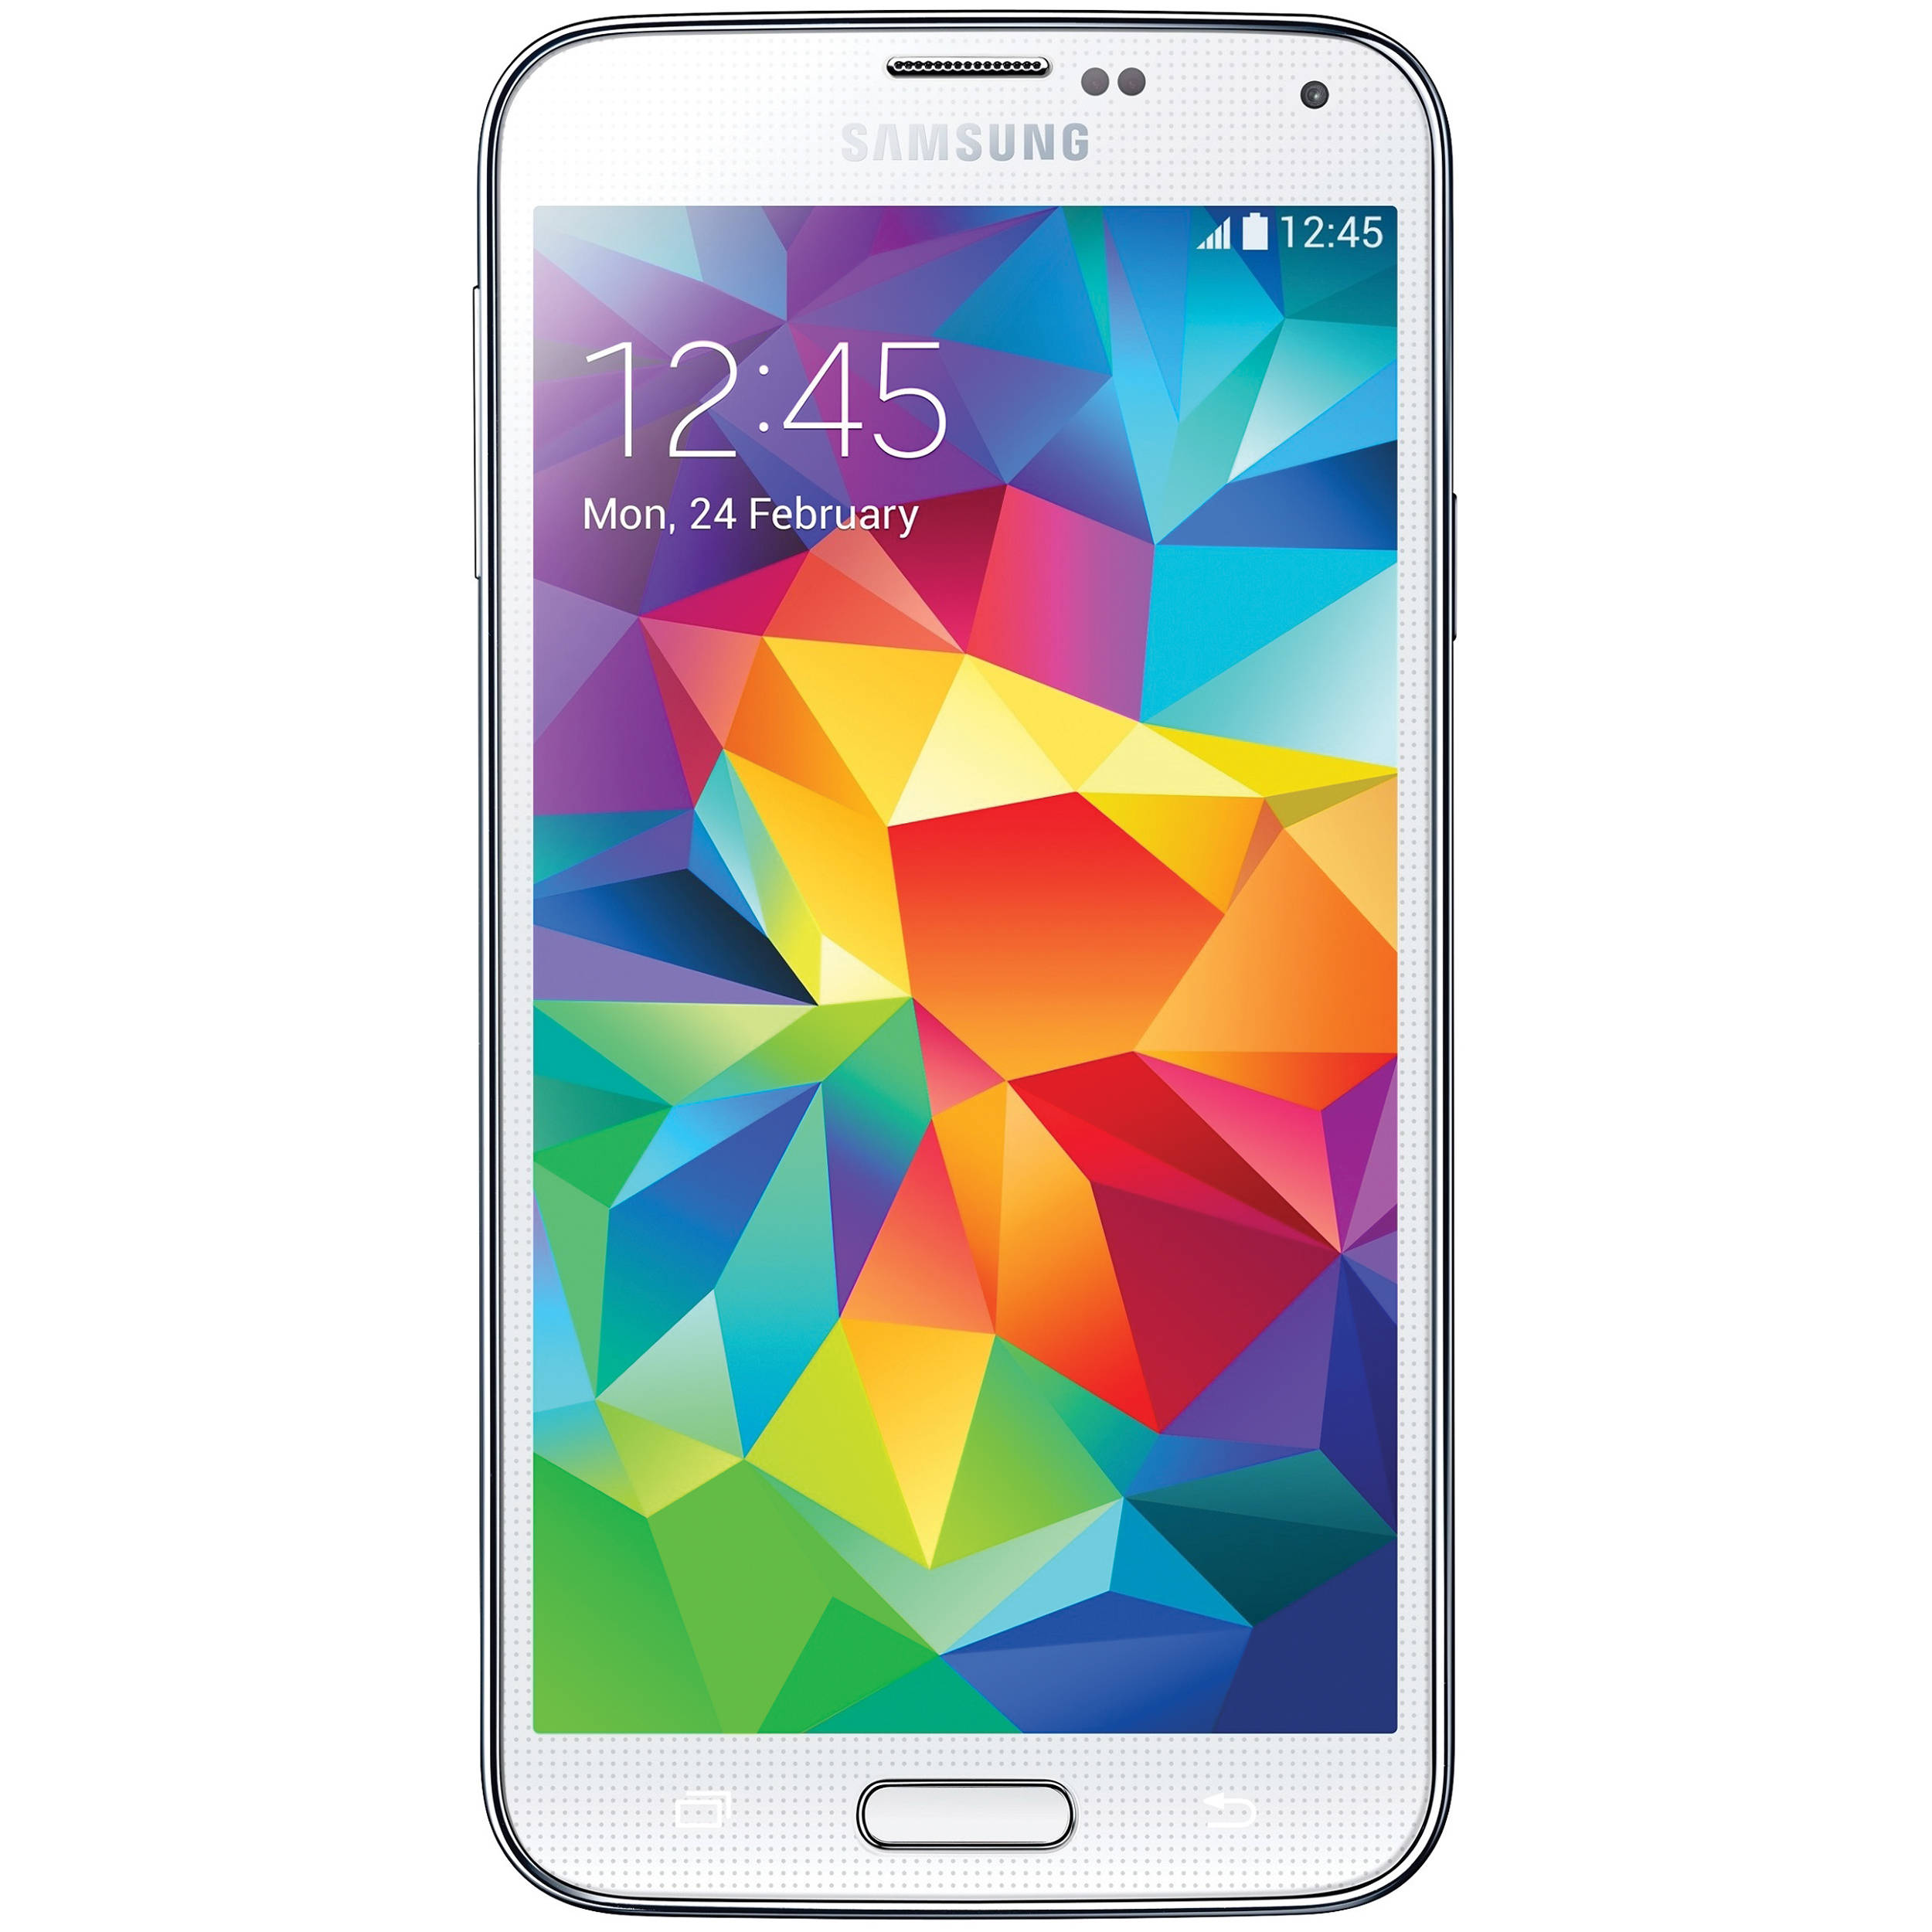 samsung galaxy s5. samsung galaxy s5 sm-g900a 16gb at\u0026t branded smartphone (unlocked, shimmery white) t